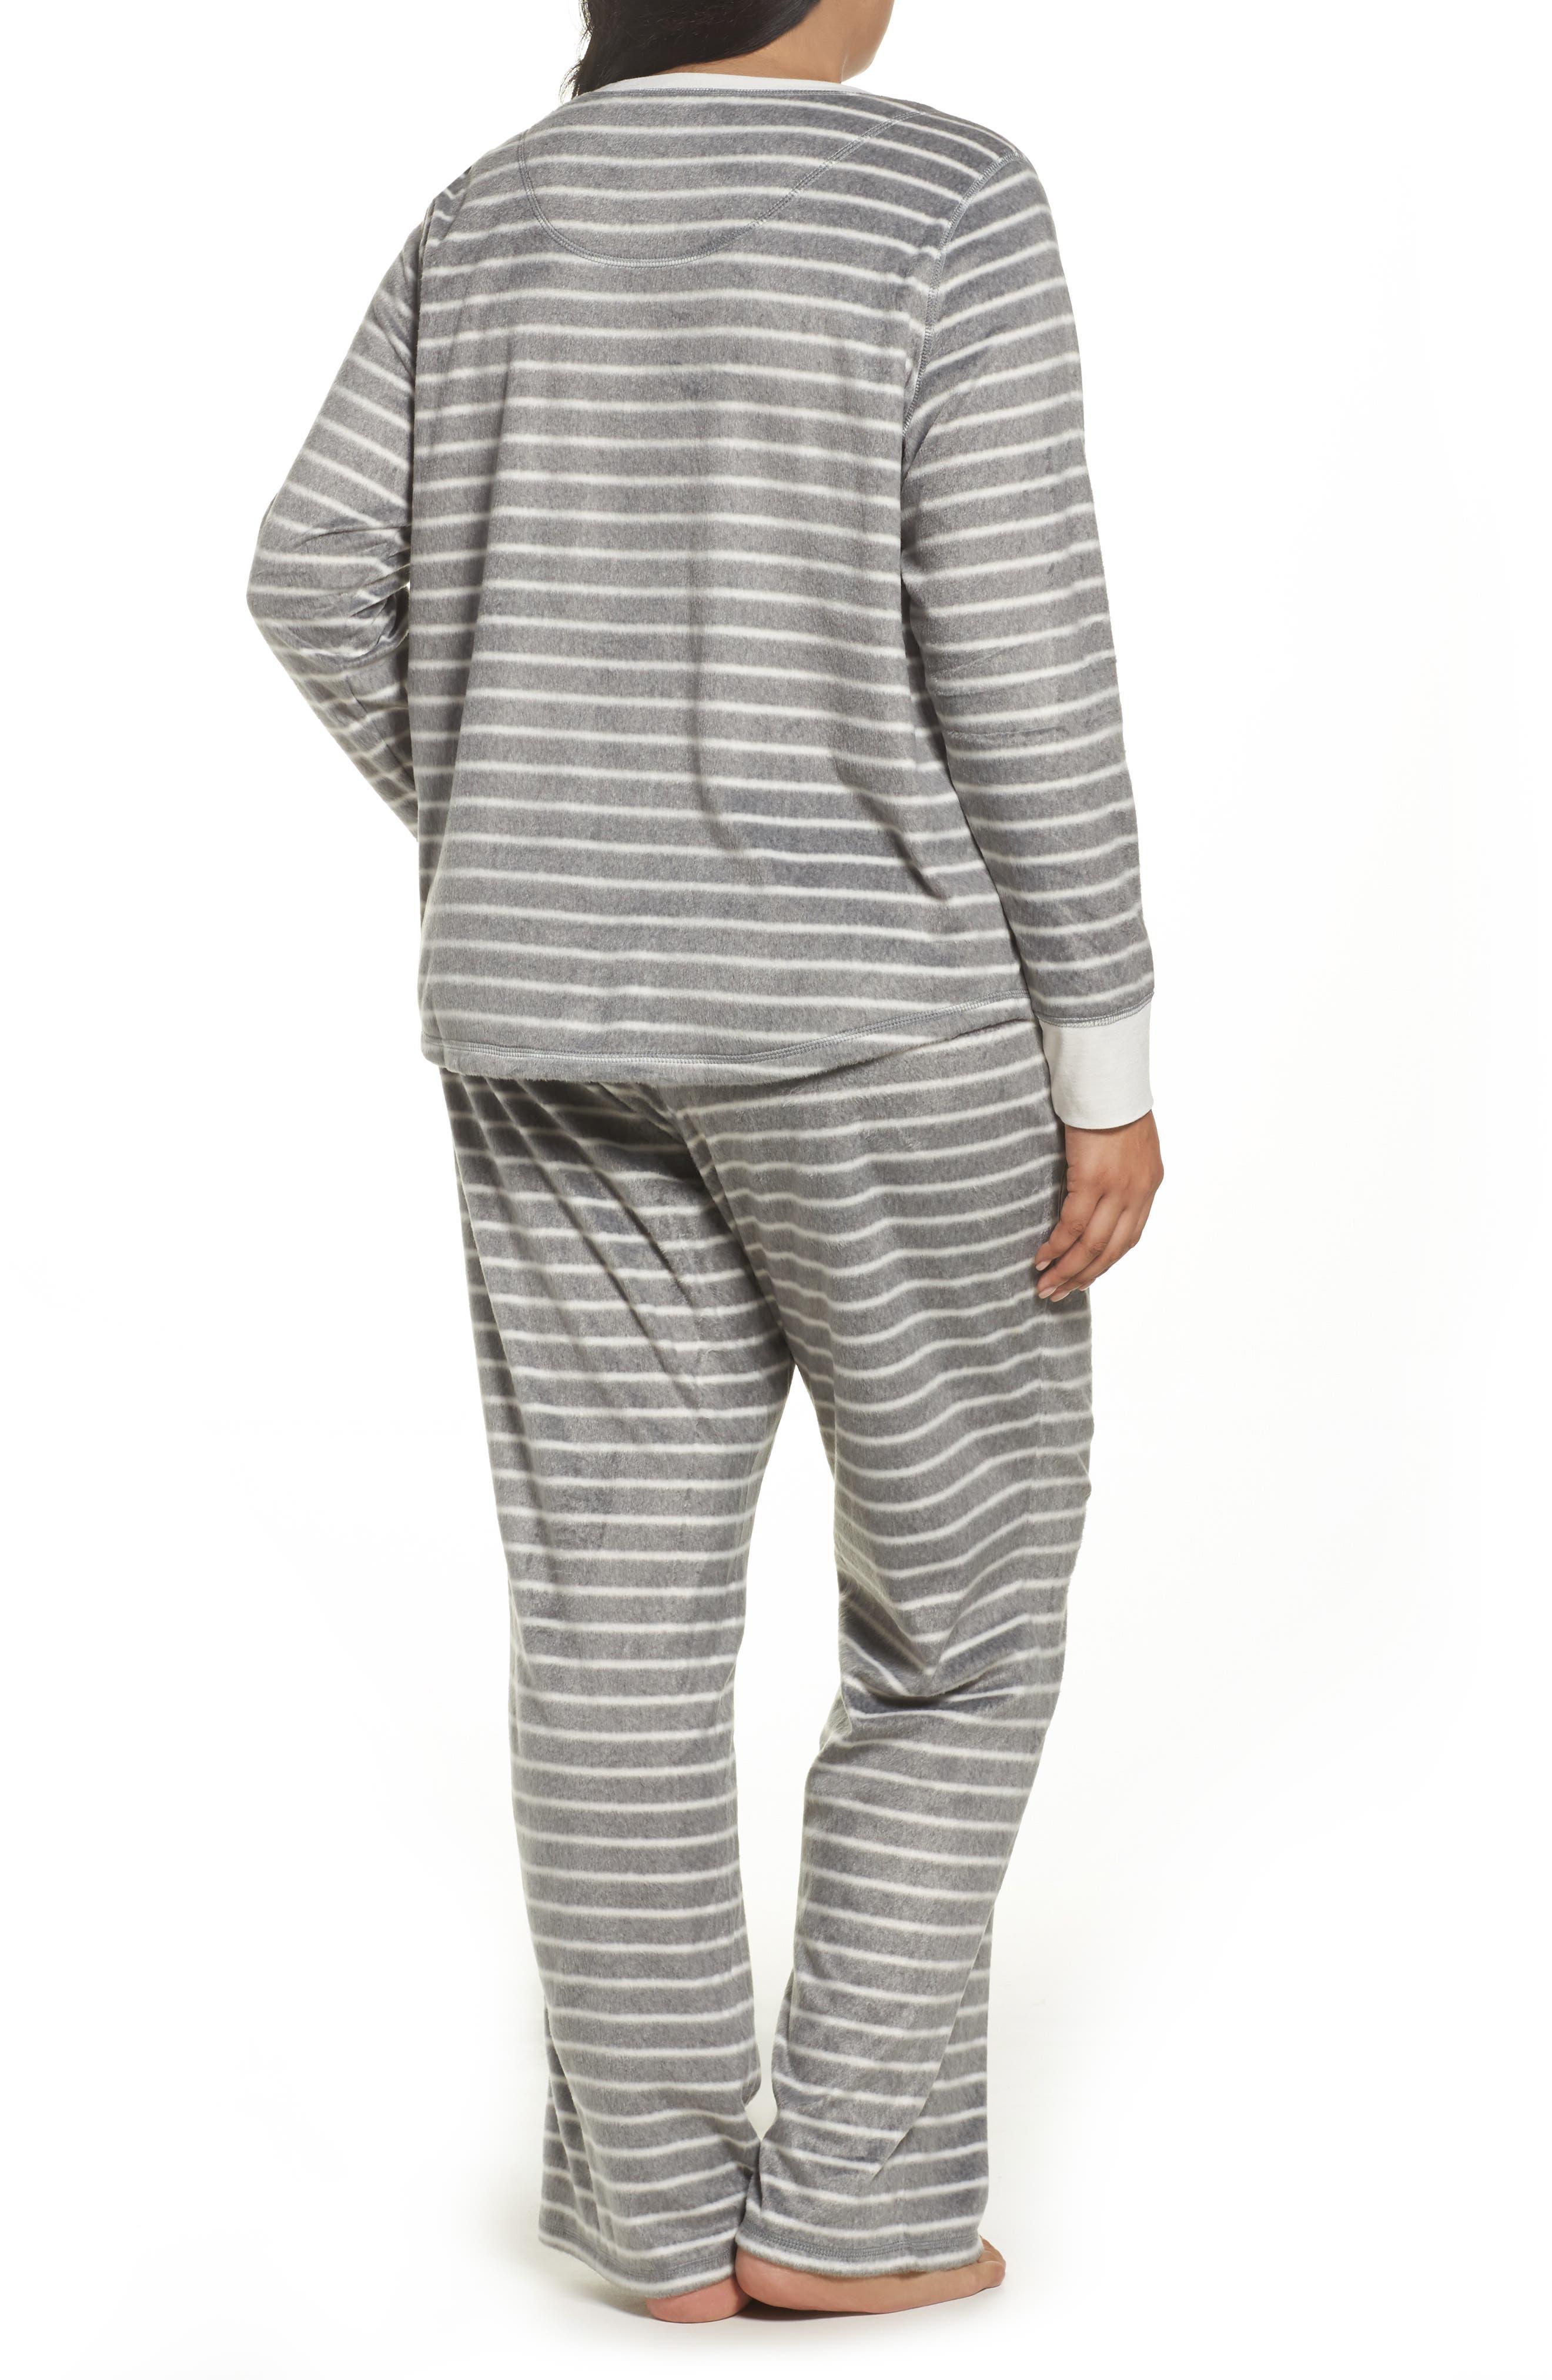 Polar Fleece Pajamas,                             Alternate thumbnail 2, color,                             Heather Grey